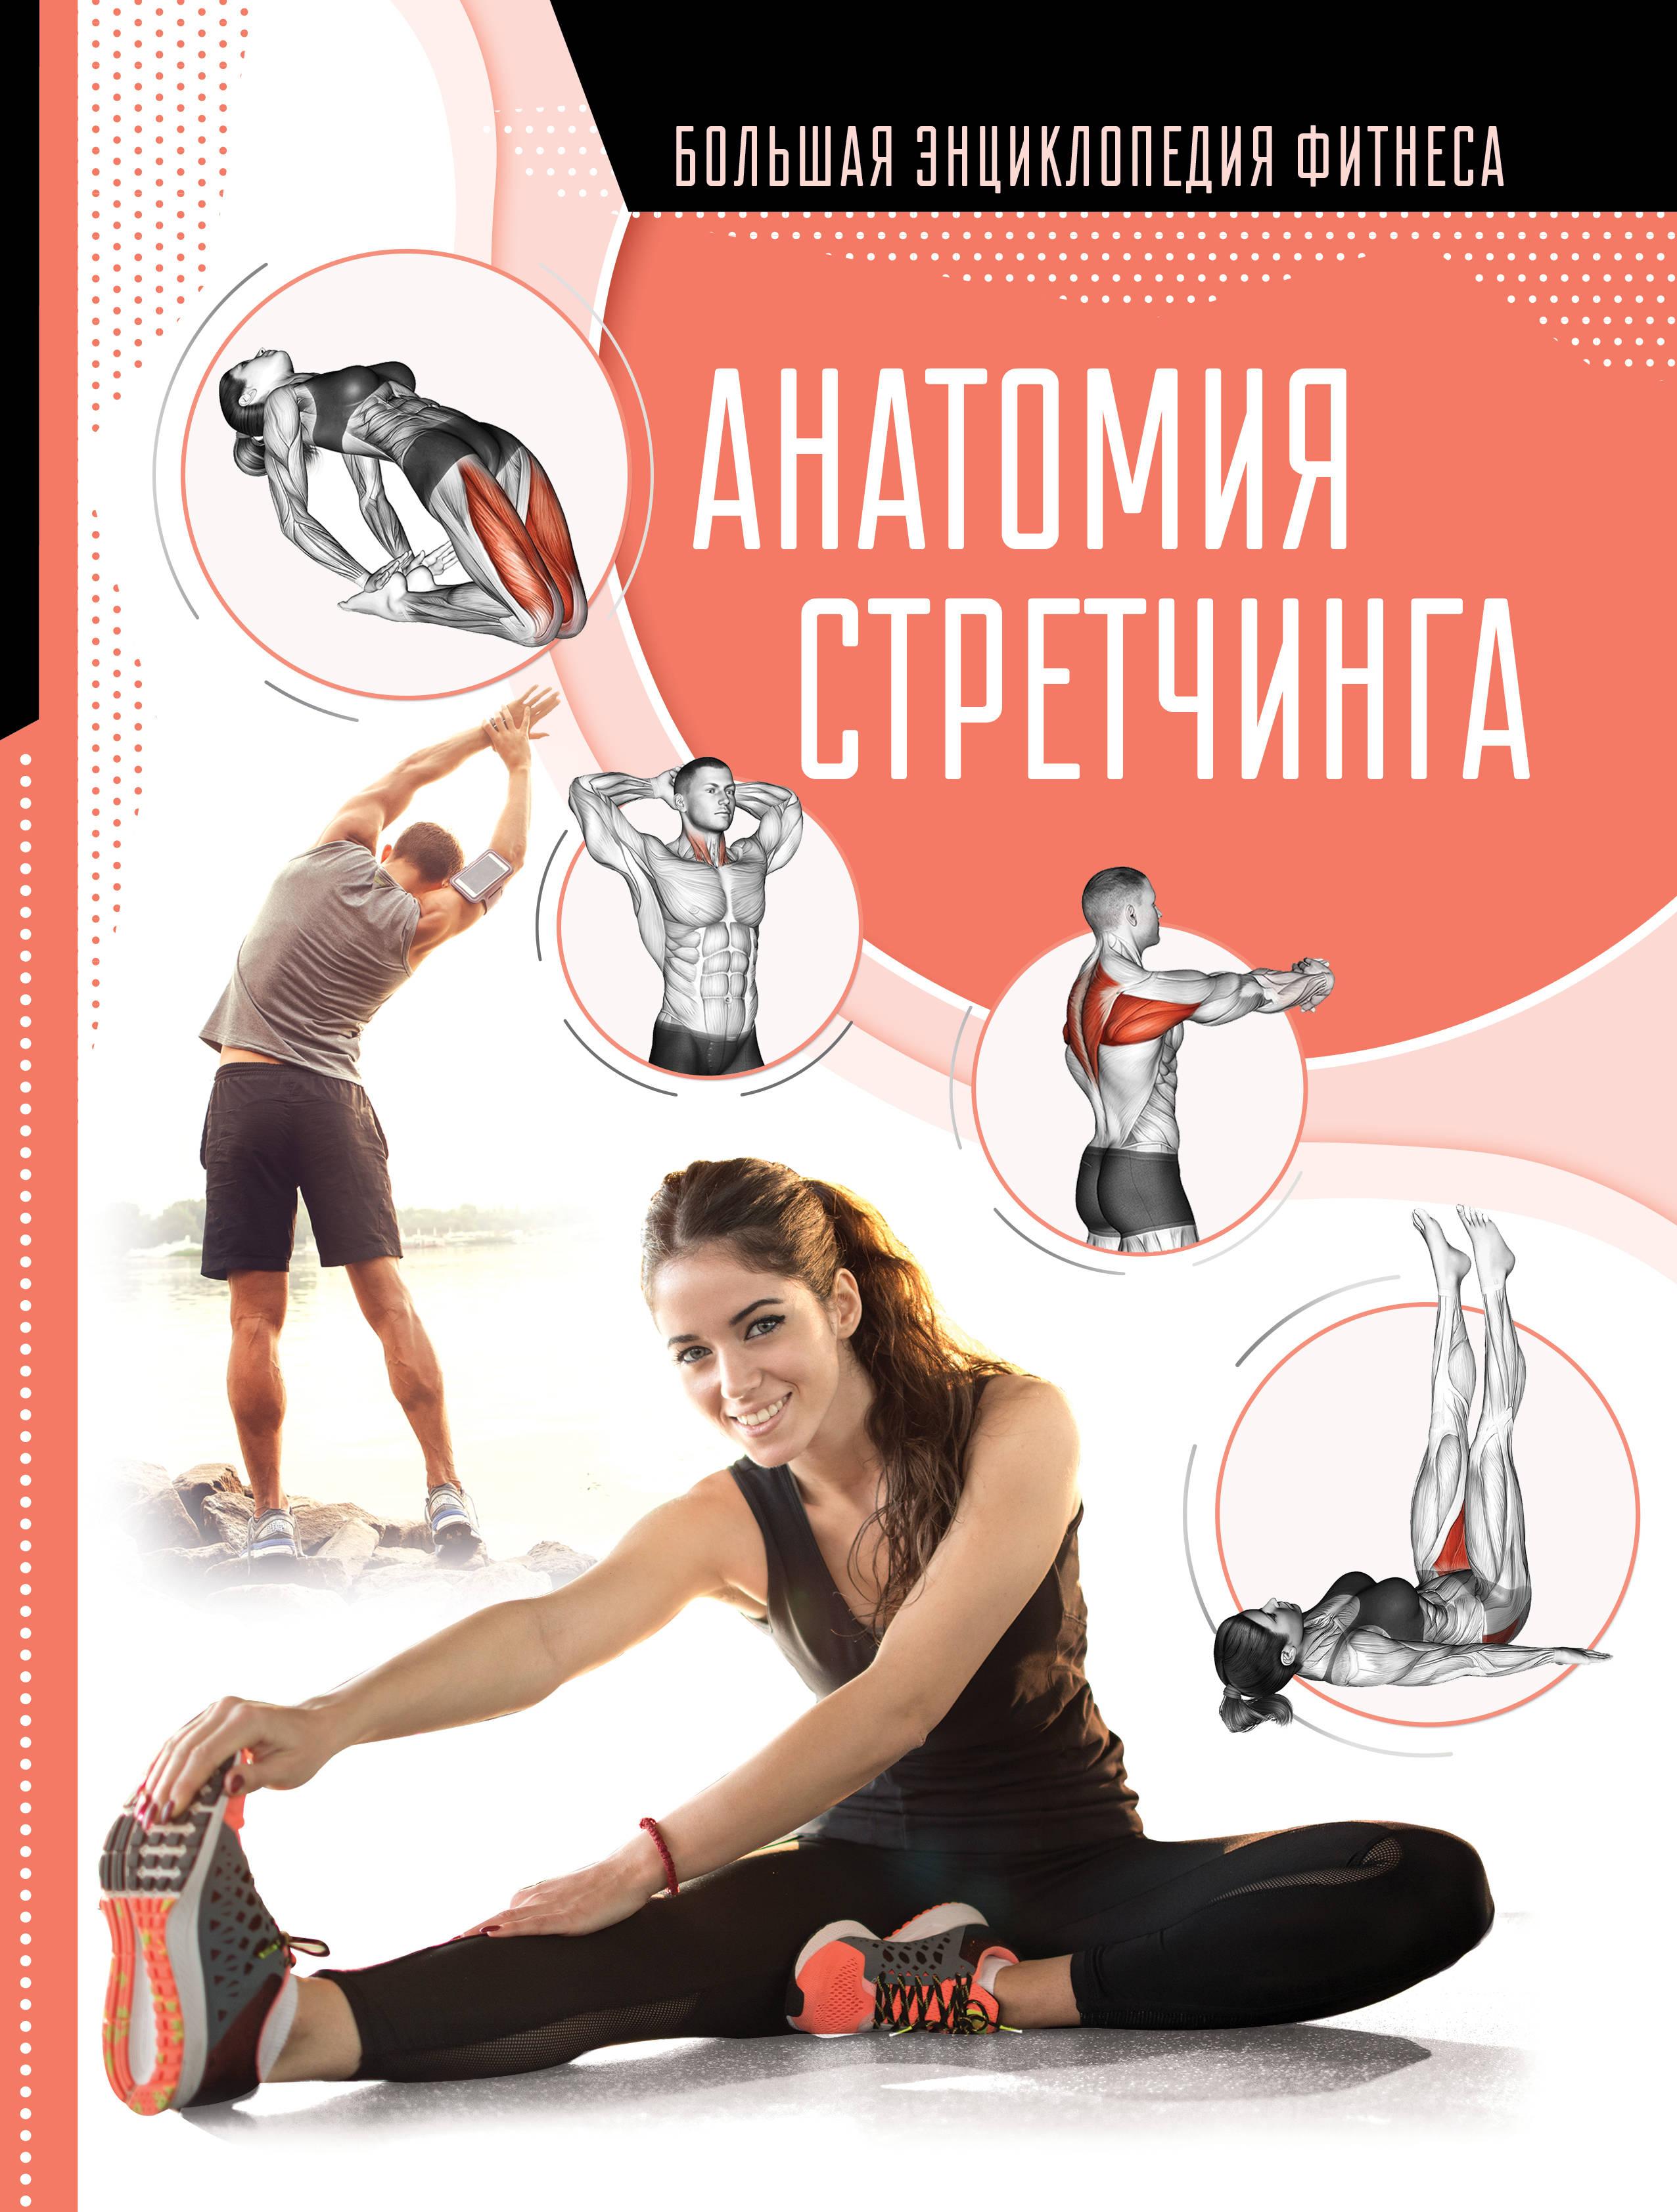 Anatomija stretchinga